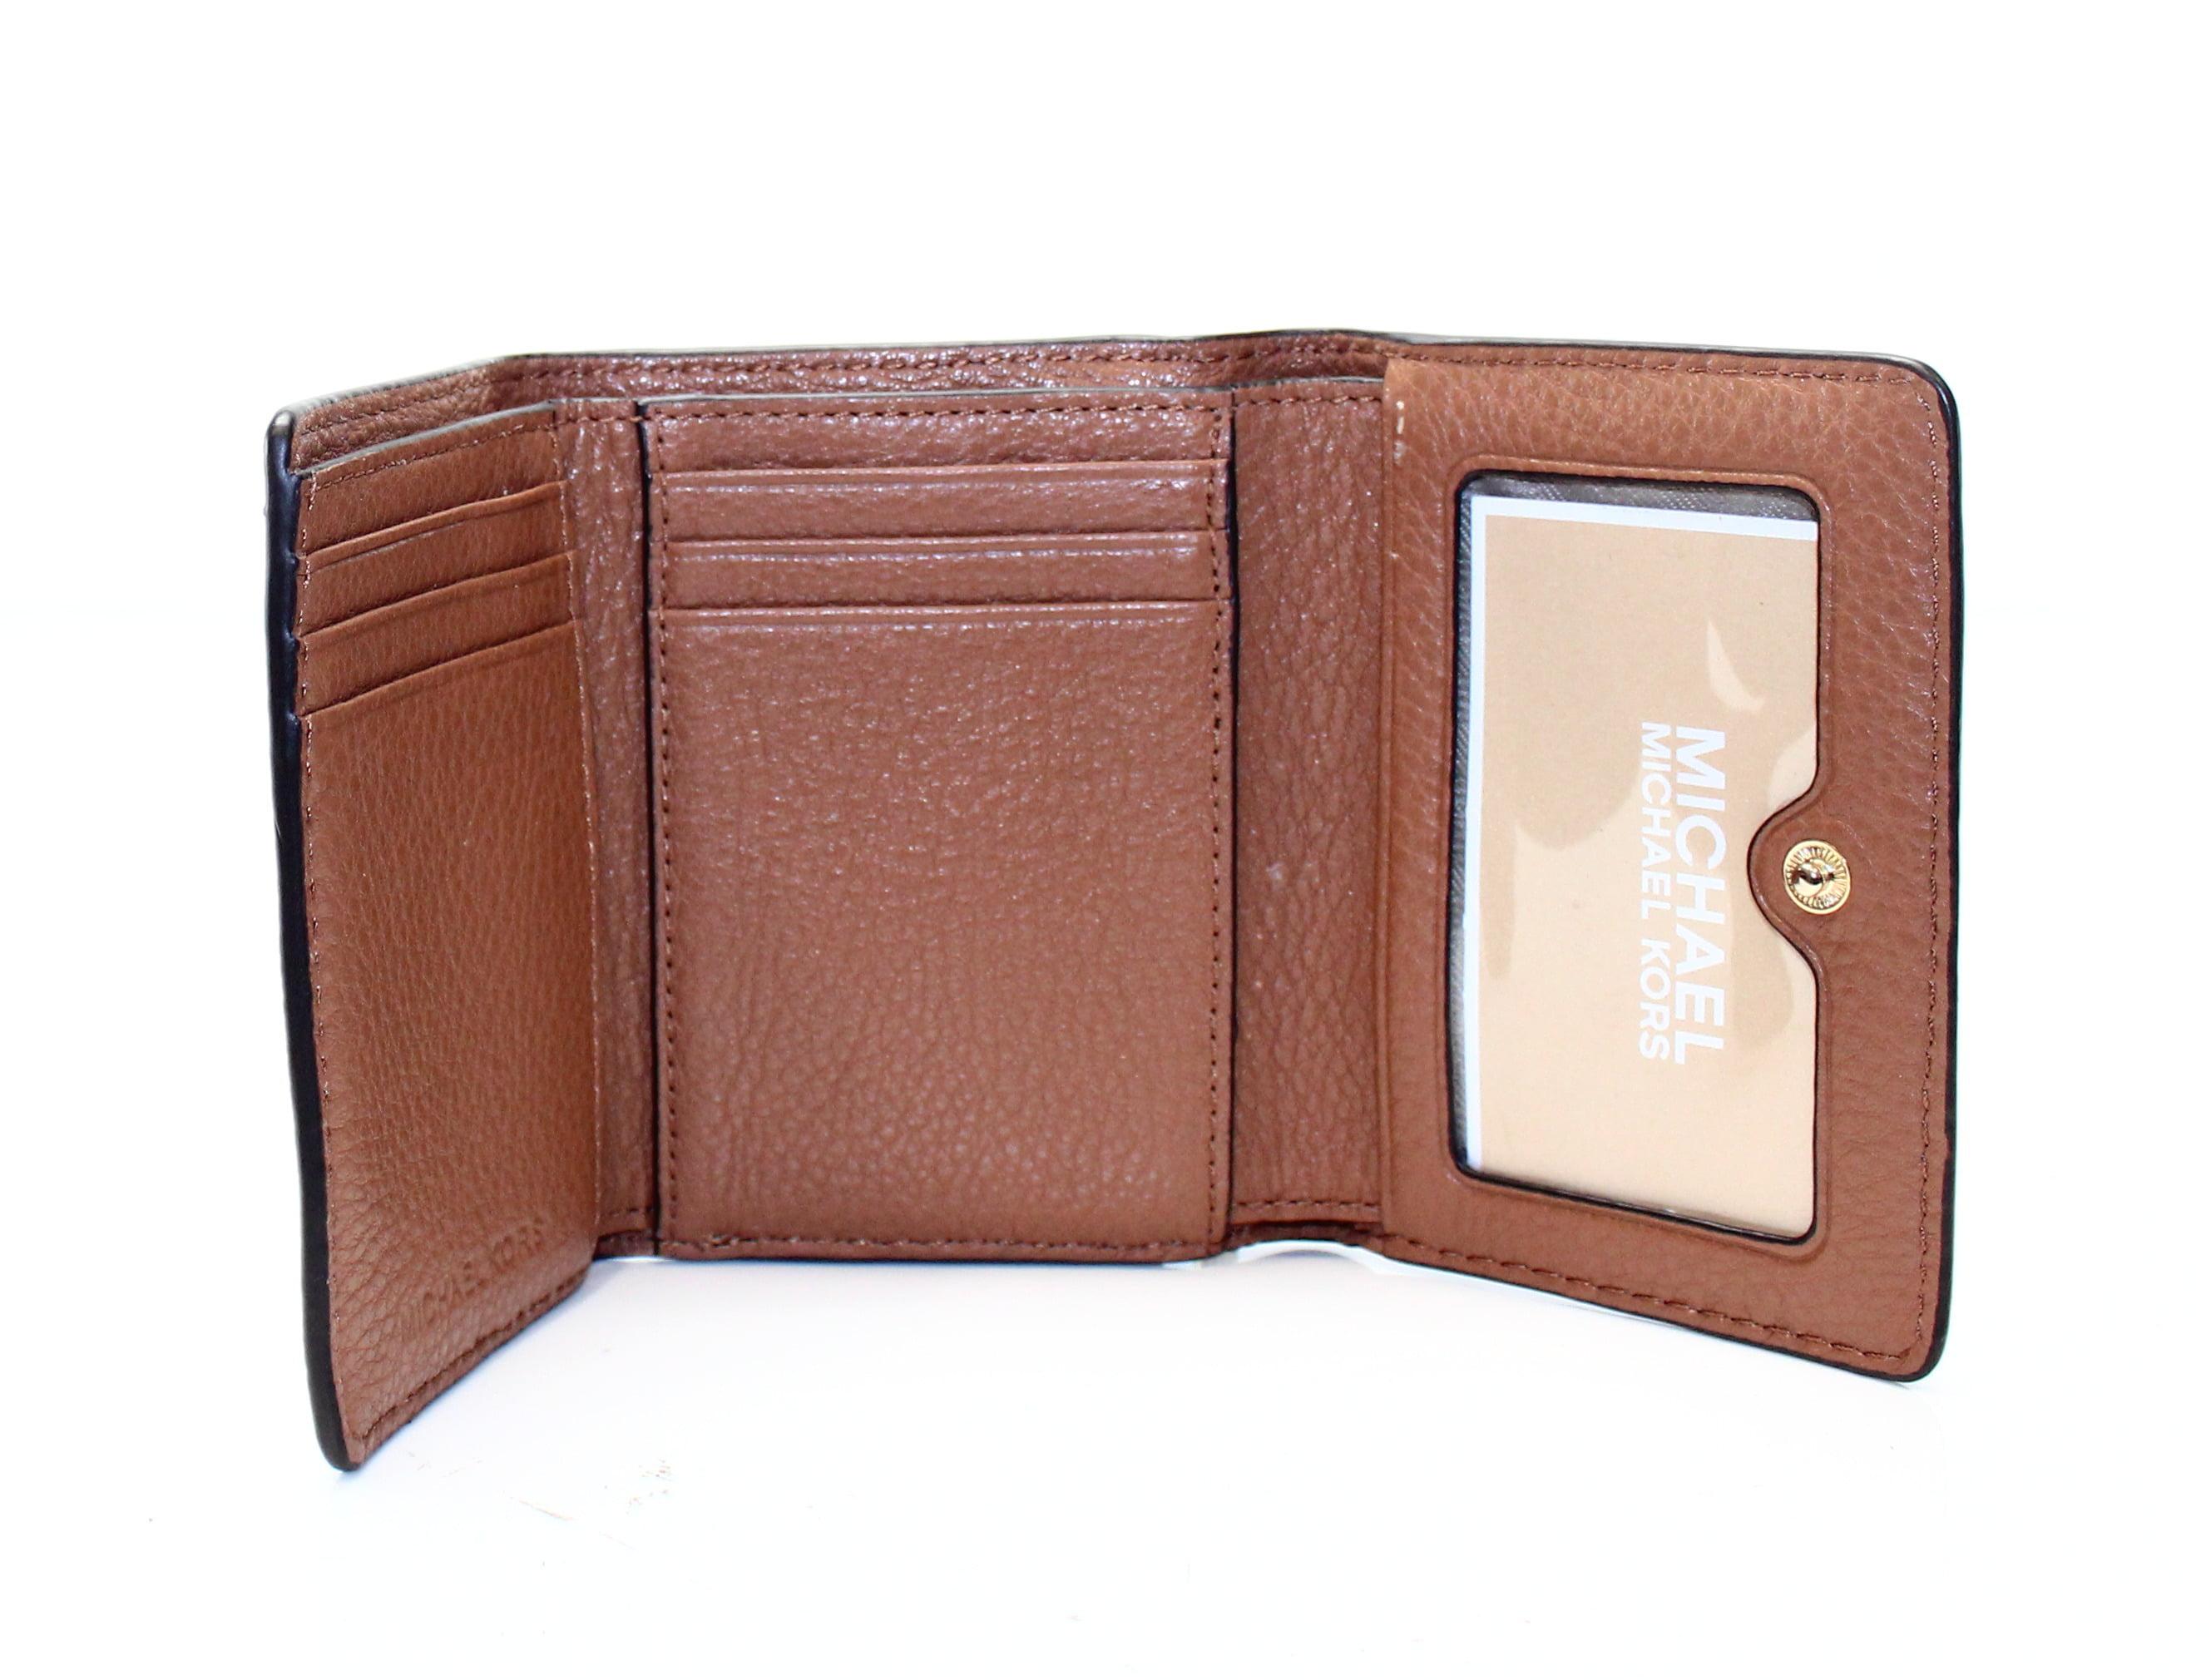 eb5c6692a3ba Michael Kors - Michael Kors NEW Brown Pebble Leather Liane Billfold Card  Holder Wallet - Walmart.com